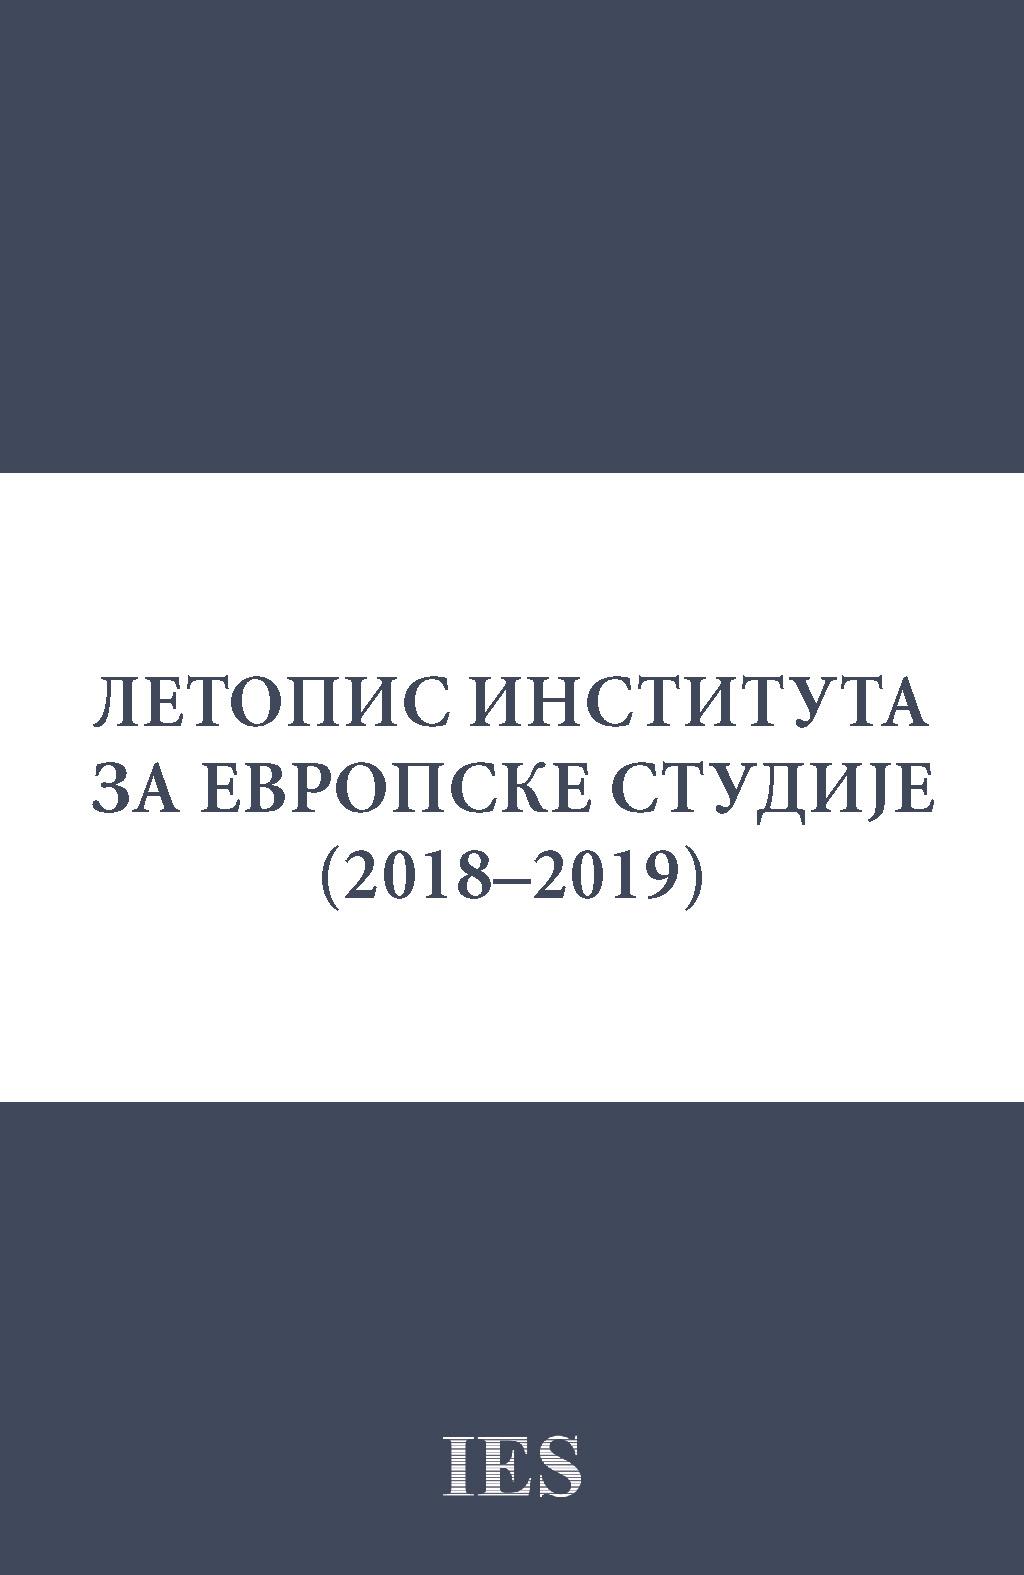 IES Yearbook 2018-2019